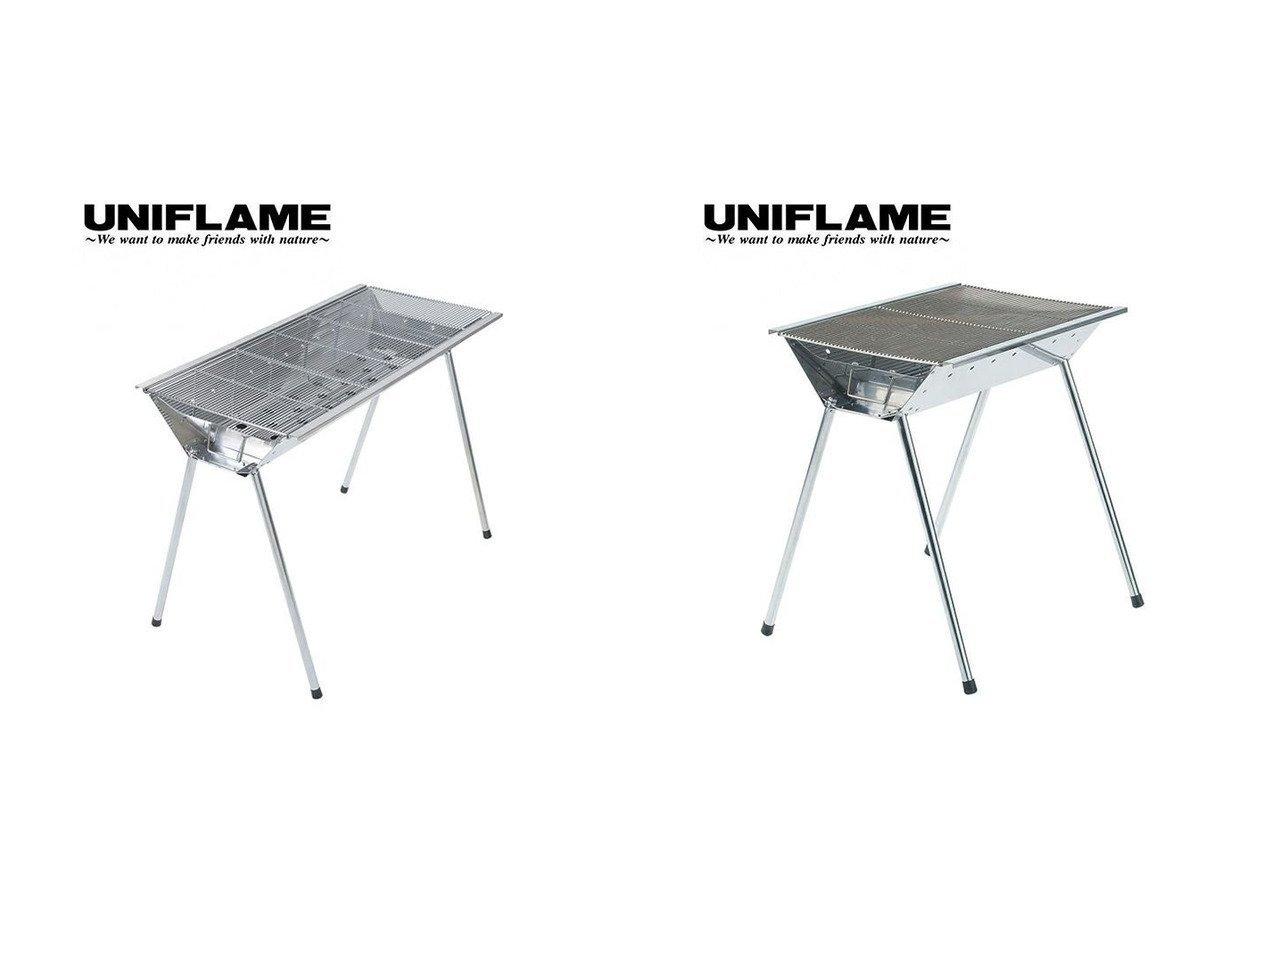 【UNIFLAME/ユニフレーム】のUFタフグリル SUS-900&UFタフグリル SUS-600 おすすめ!人気キャンプ・アウトドア用品の通販 おすすめで人気の流行・トレンド、ファッションの通販商品 インテリア・家具・メンズファッション・キッズファッション・レディースファッション・服の通販 founy(ファニー) https://founy.com/ ホーム・キャンプ・アウトドア Home,Garden,Outdoor,Camping Gear キャンプ用品・アウトドア  Camping Gear & Outdoor Supplies バーナー グリル Burner, Grill  ID:crp329100000046241